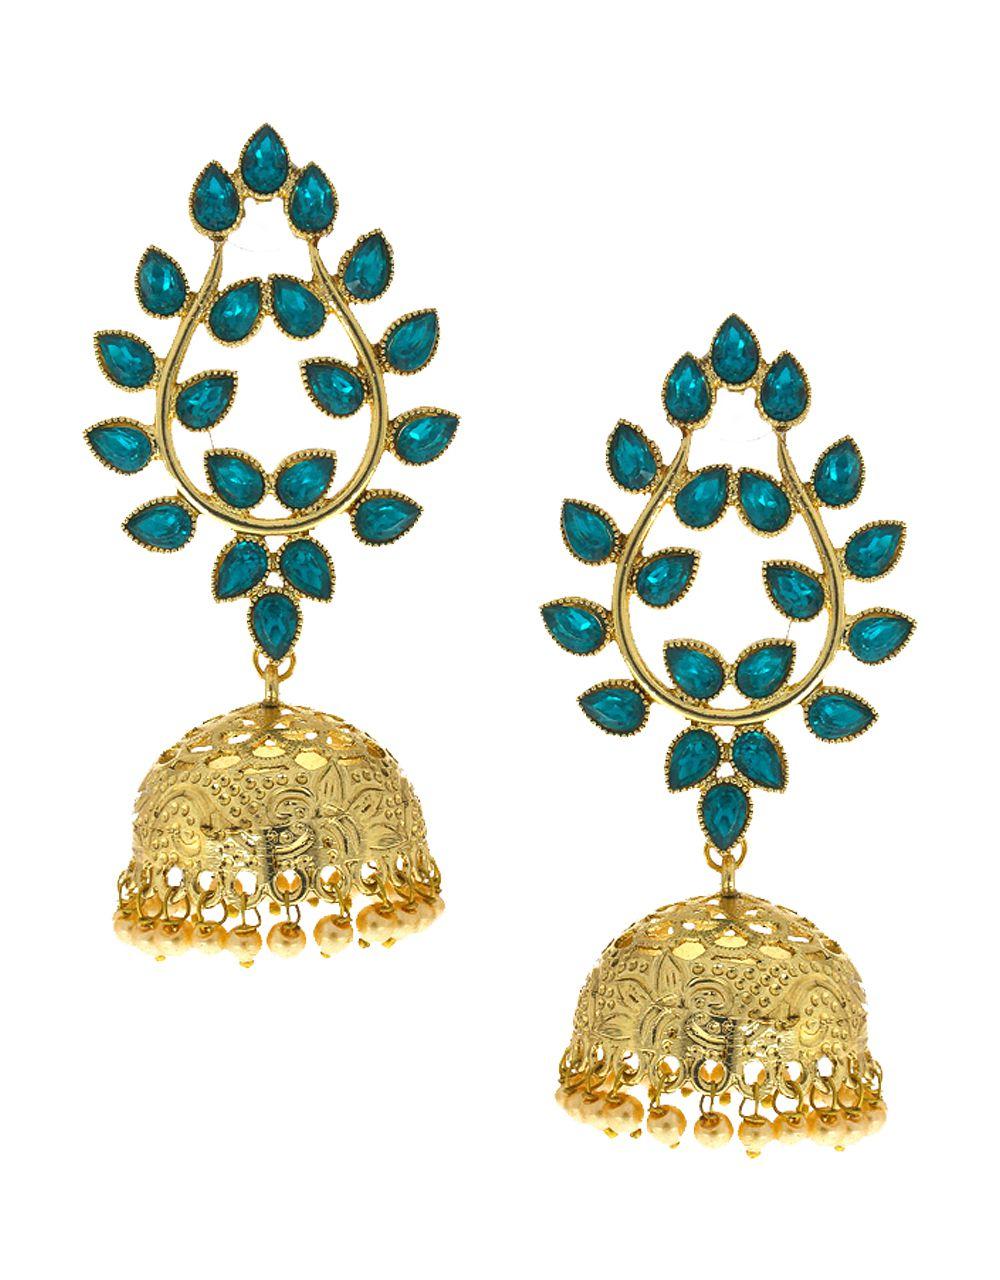 Anuradha Art Exclusive Blue Colour Studded Sparkling Stones Eye-Pleasing Designer Jhumki/Jhumkas Traditional Earrings For Women/Girls